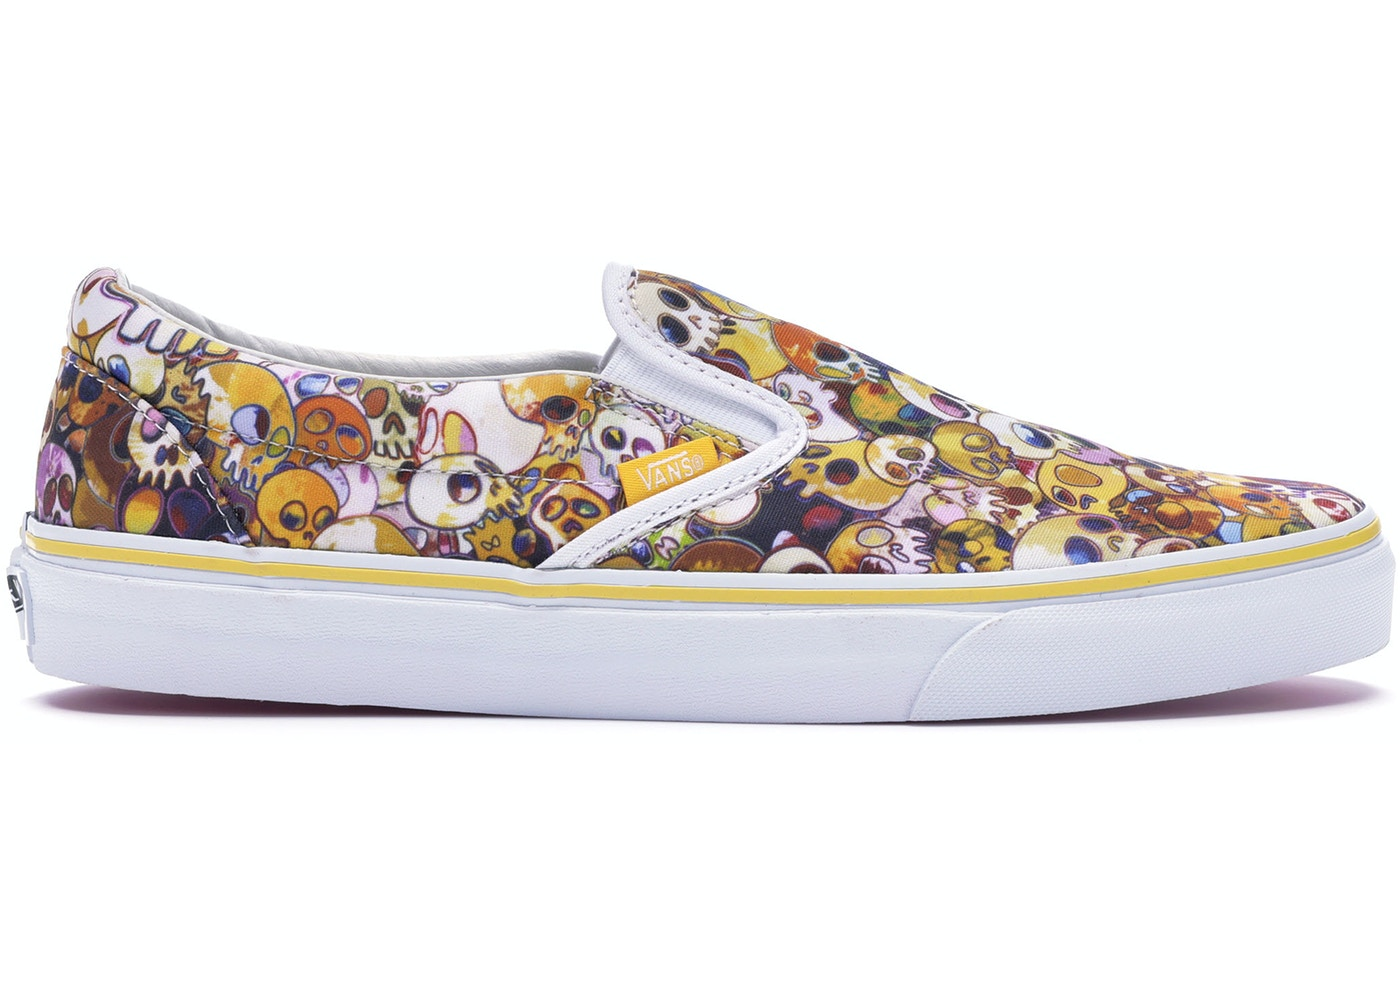 95548053d0 Vans Slip-On LX Murakami Yellow Skull - VN-0ZSIGUI